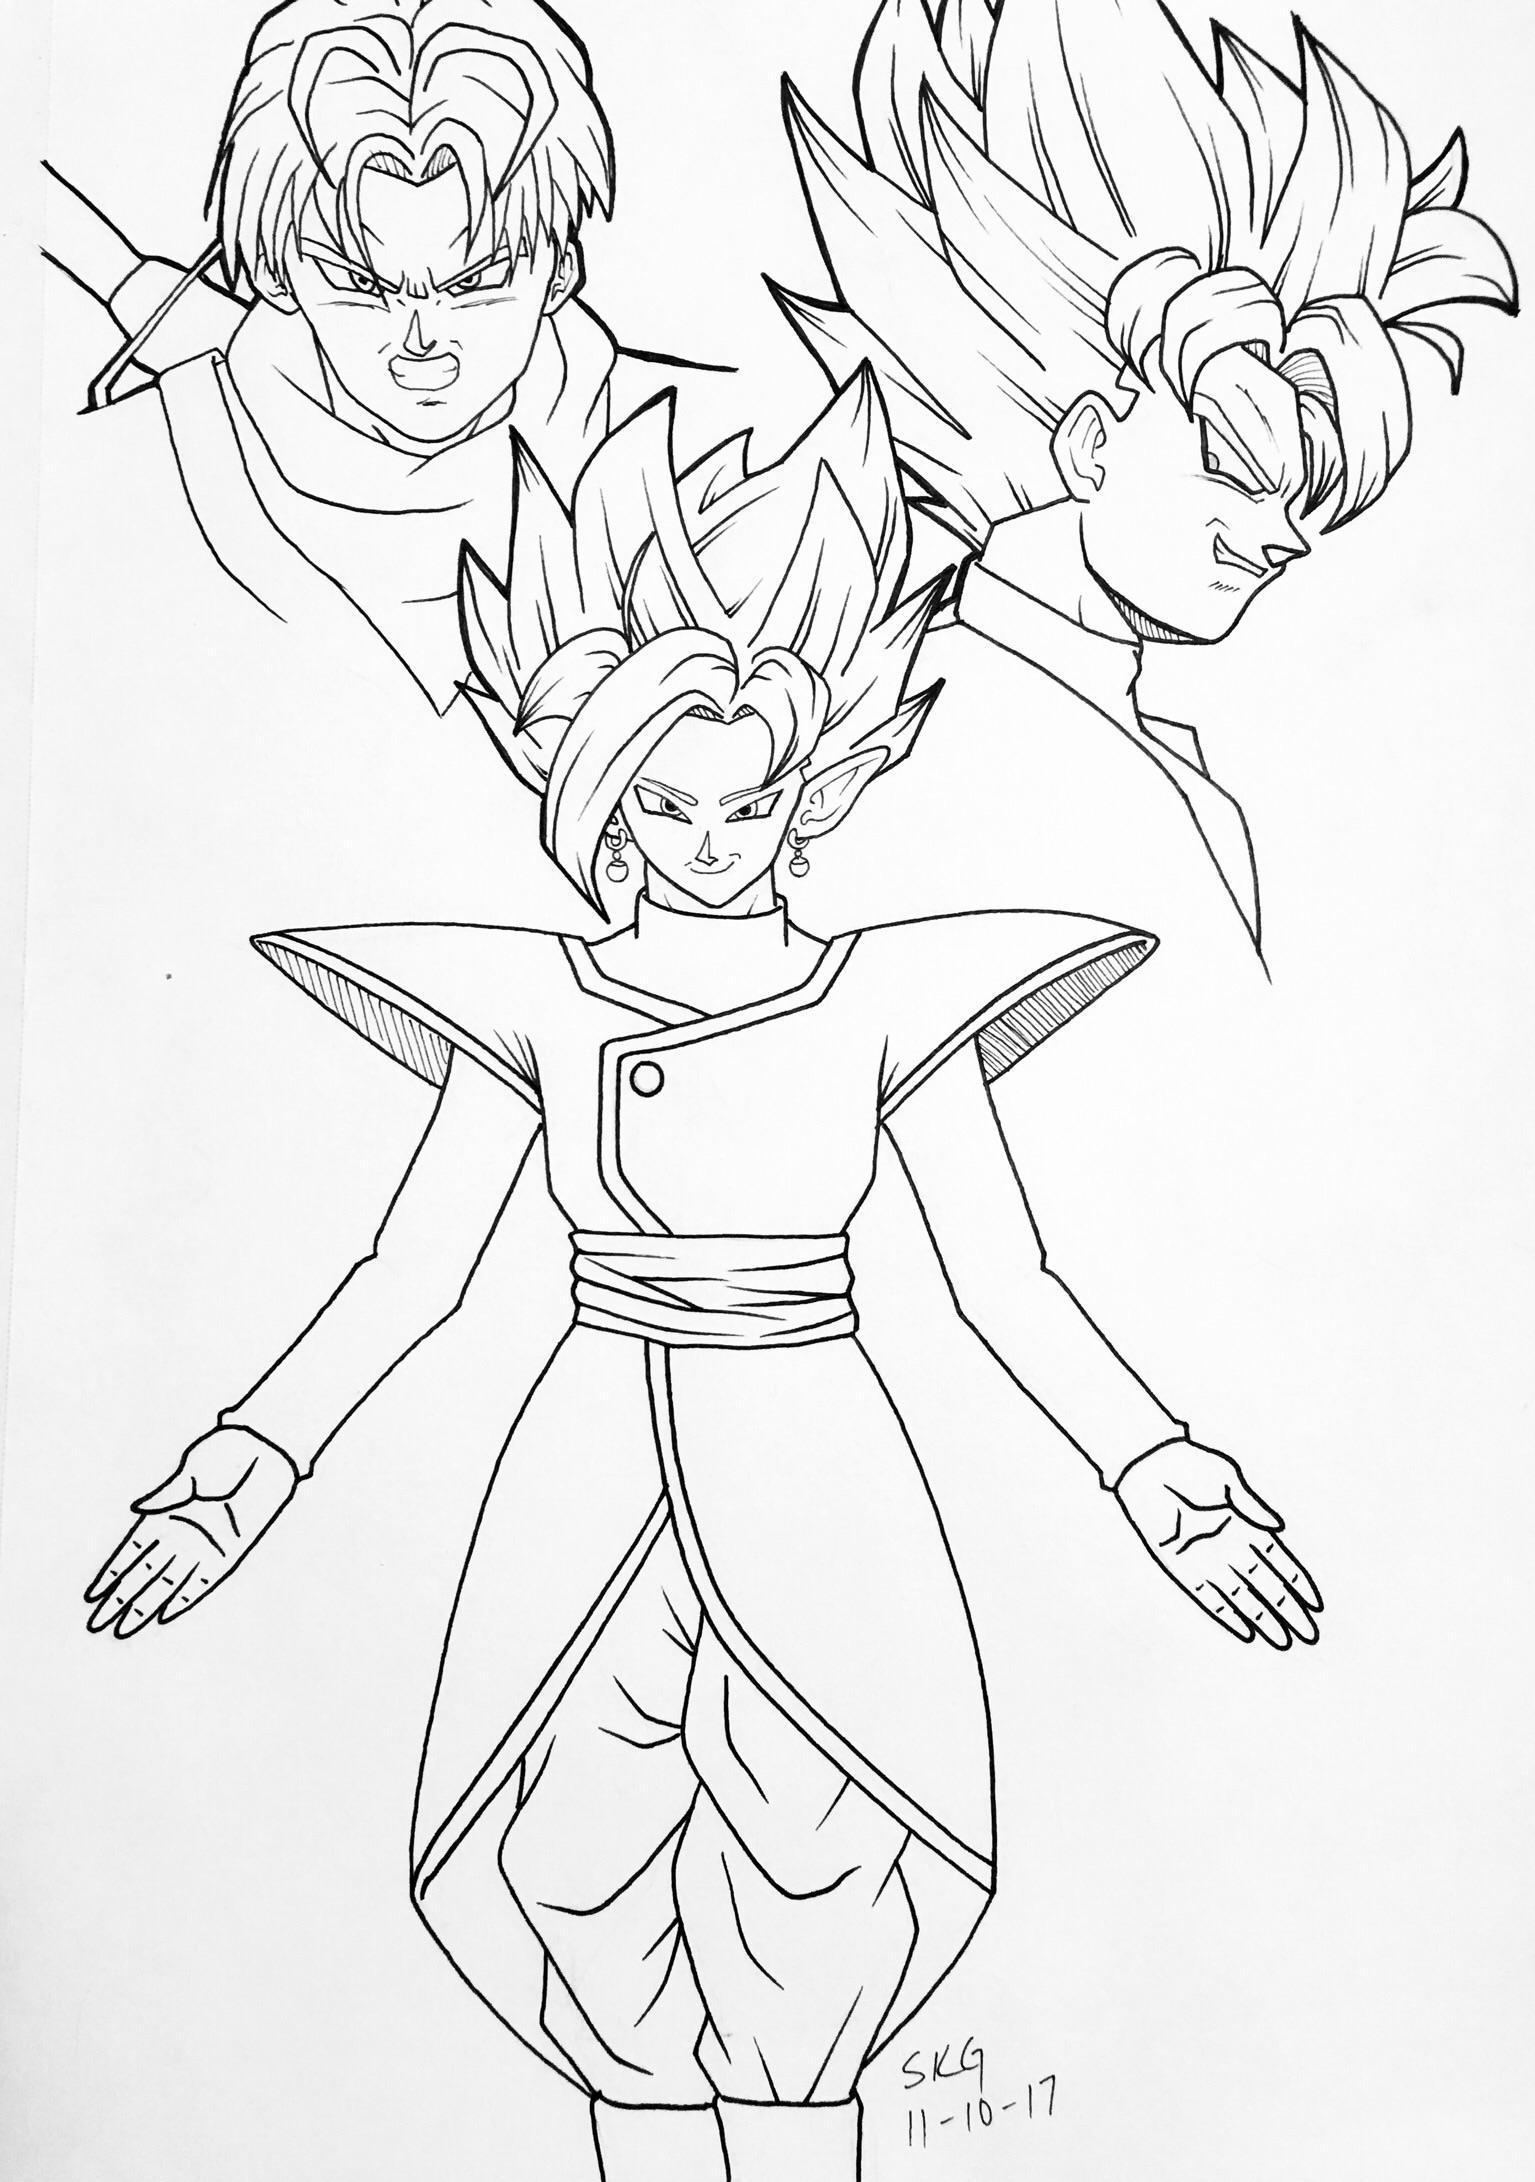 [OC] Fused Zamasu, Goku Black, & Trunks. Please critique